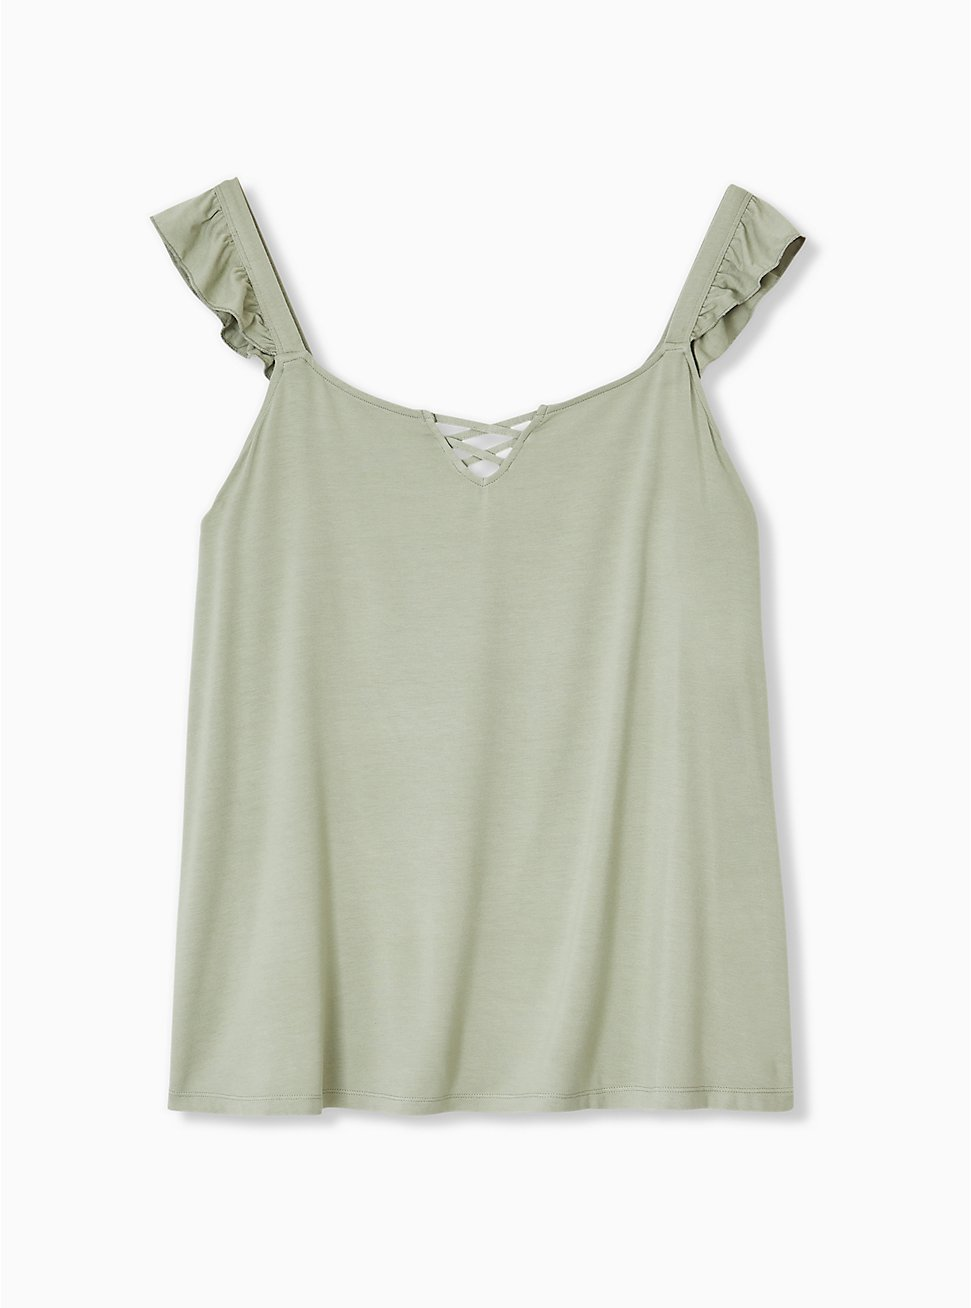 Plus Size Super Soft Jade Green Lattice Ruffle Sleeve Top, SEA GLASS, hi-res